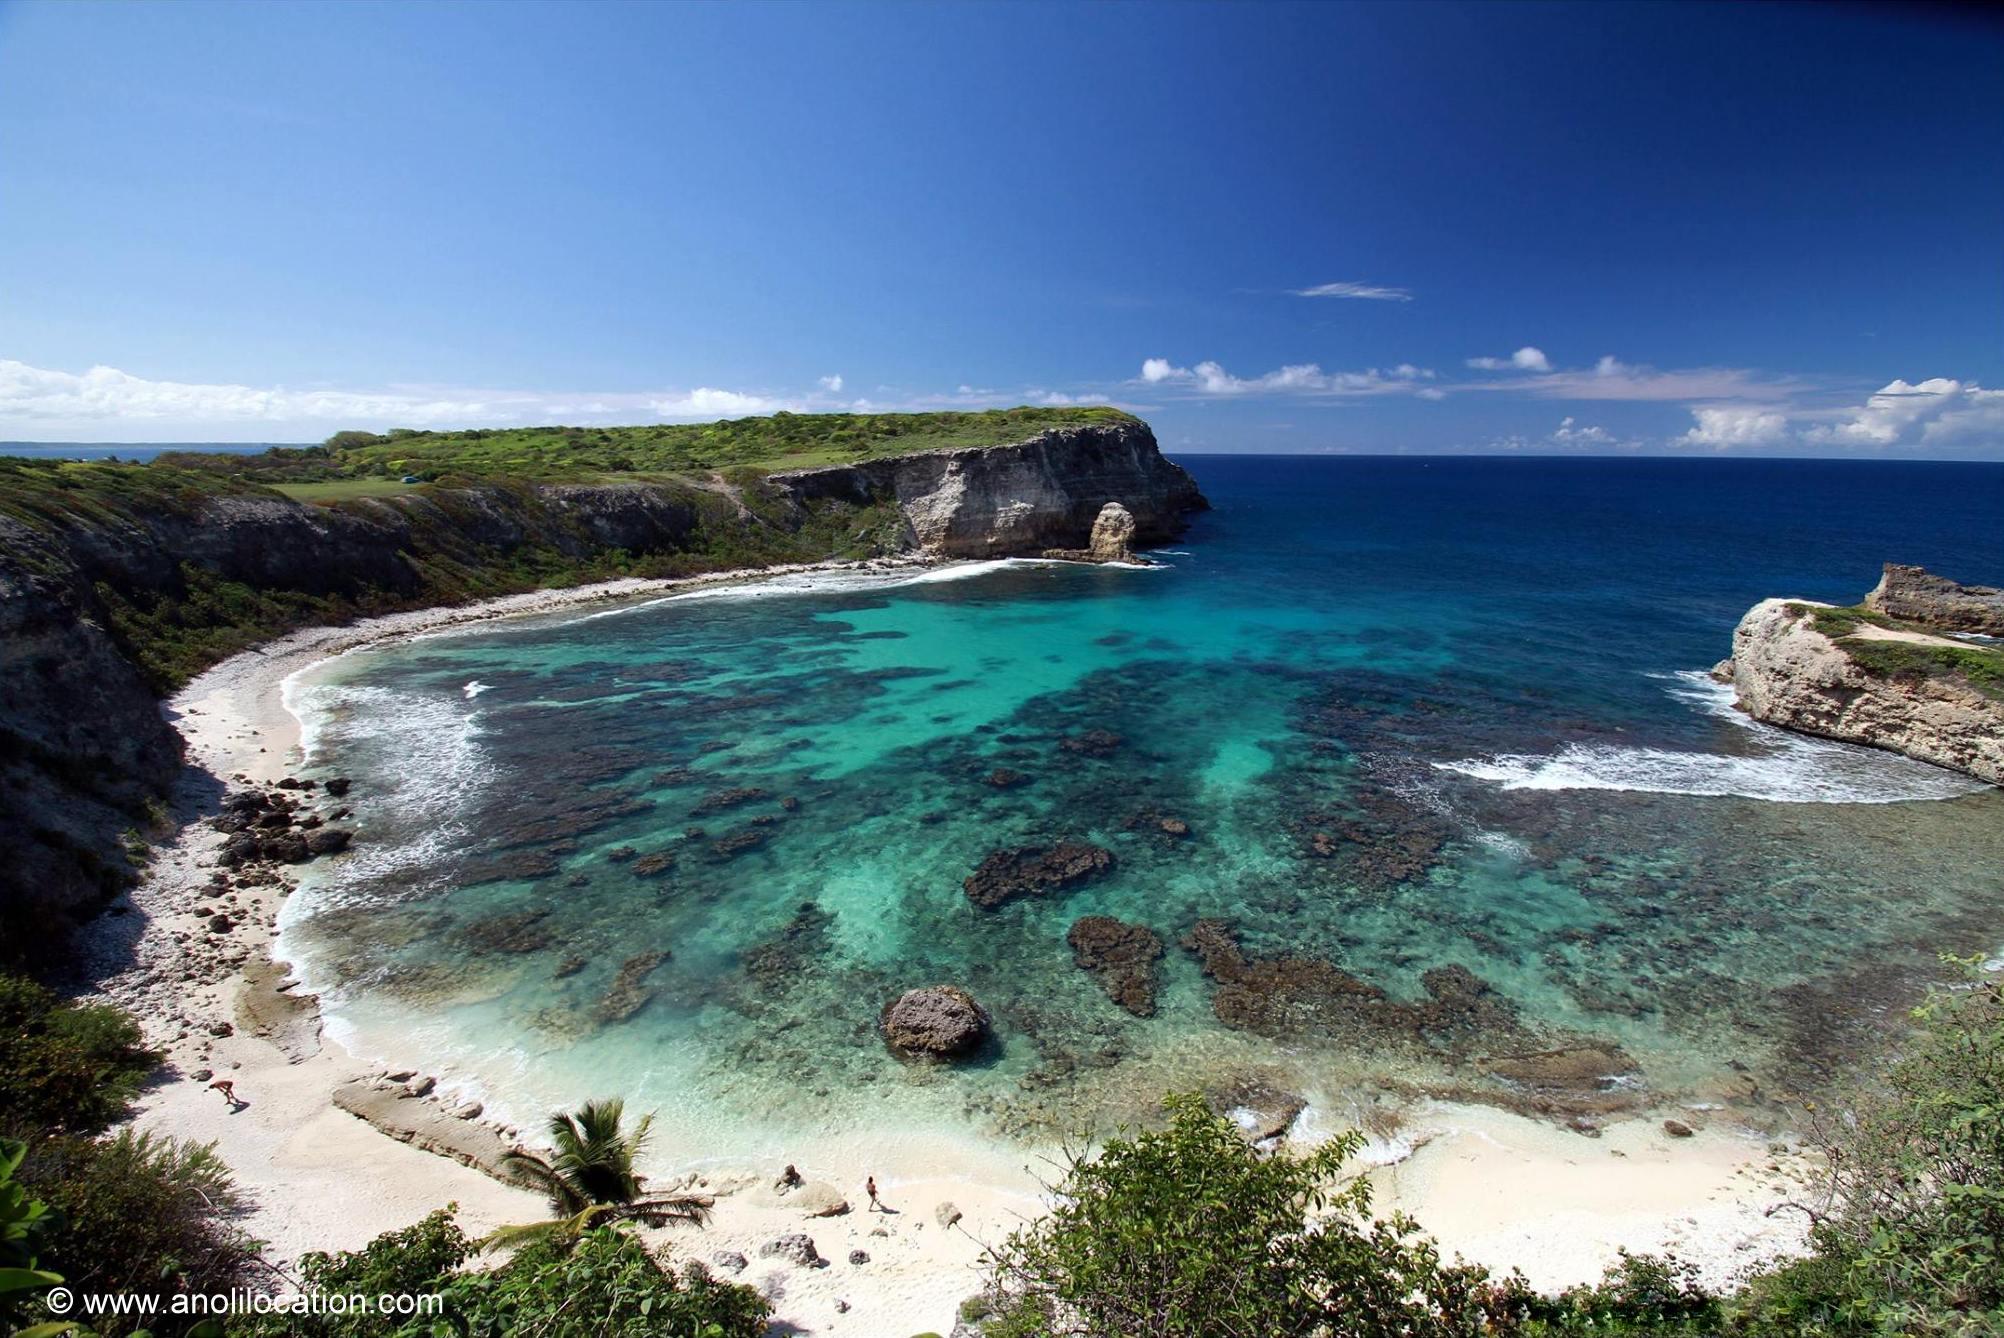 Anoli Location_Petite Porte d'Enfer Guadeloupe